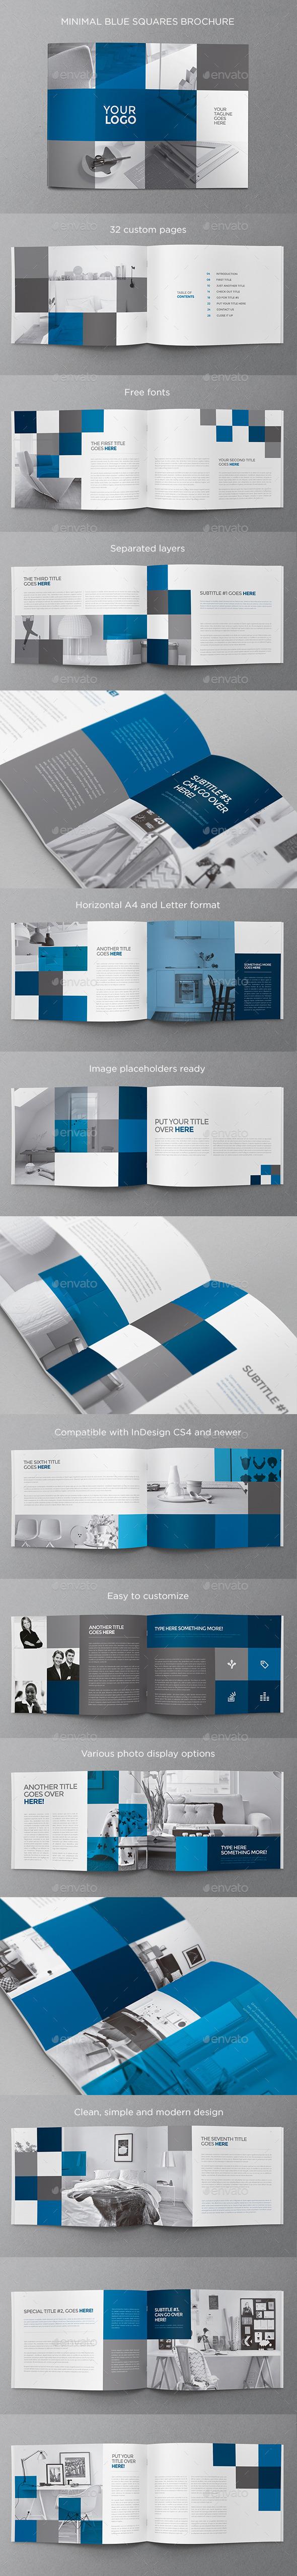 GraphicRiver Minimal Blue Squares Brochure 11921055